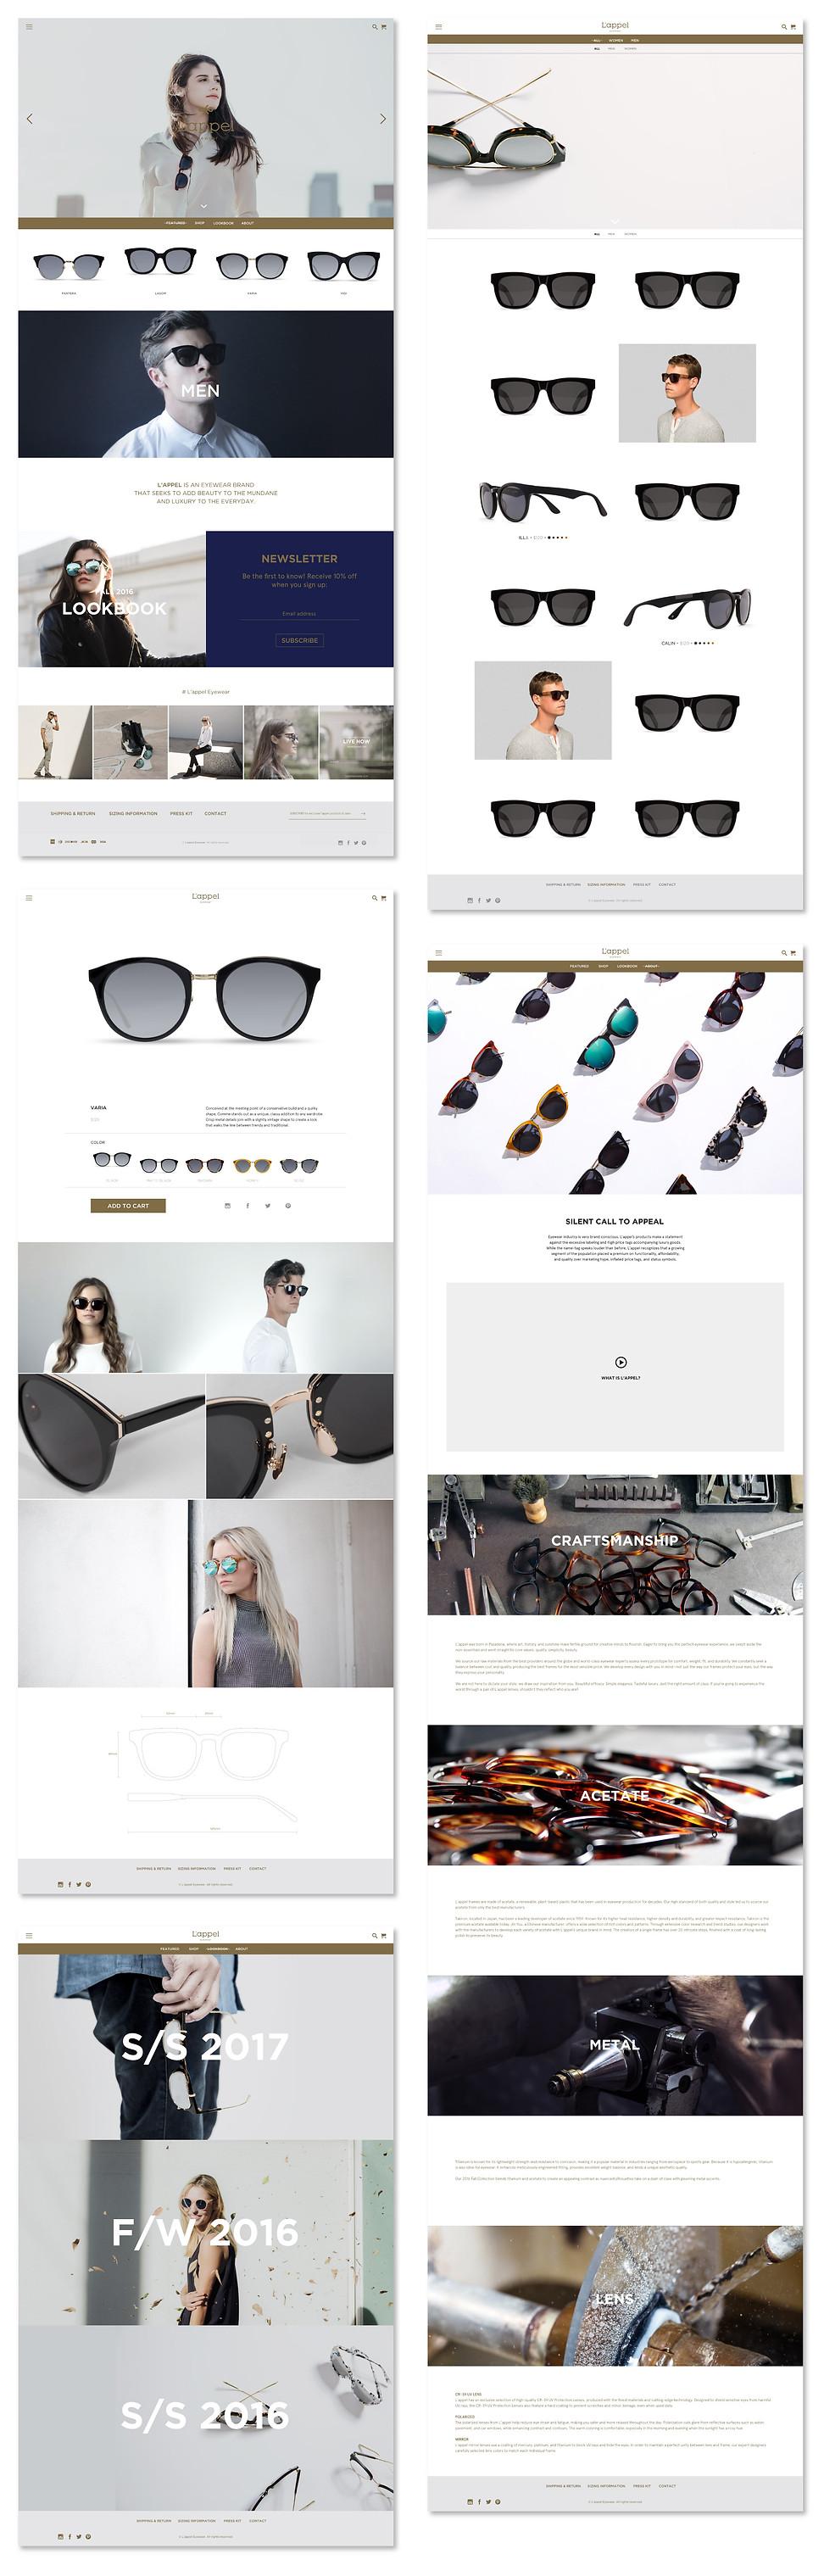 Lappel-web-1.jpg